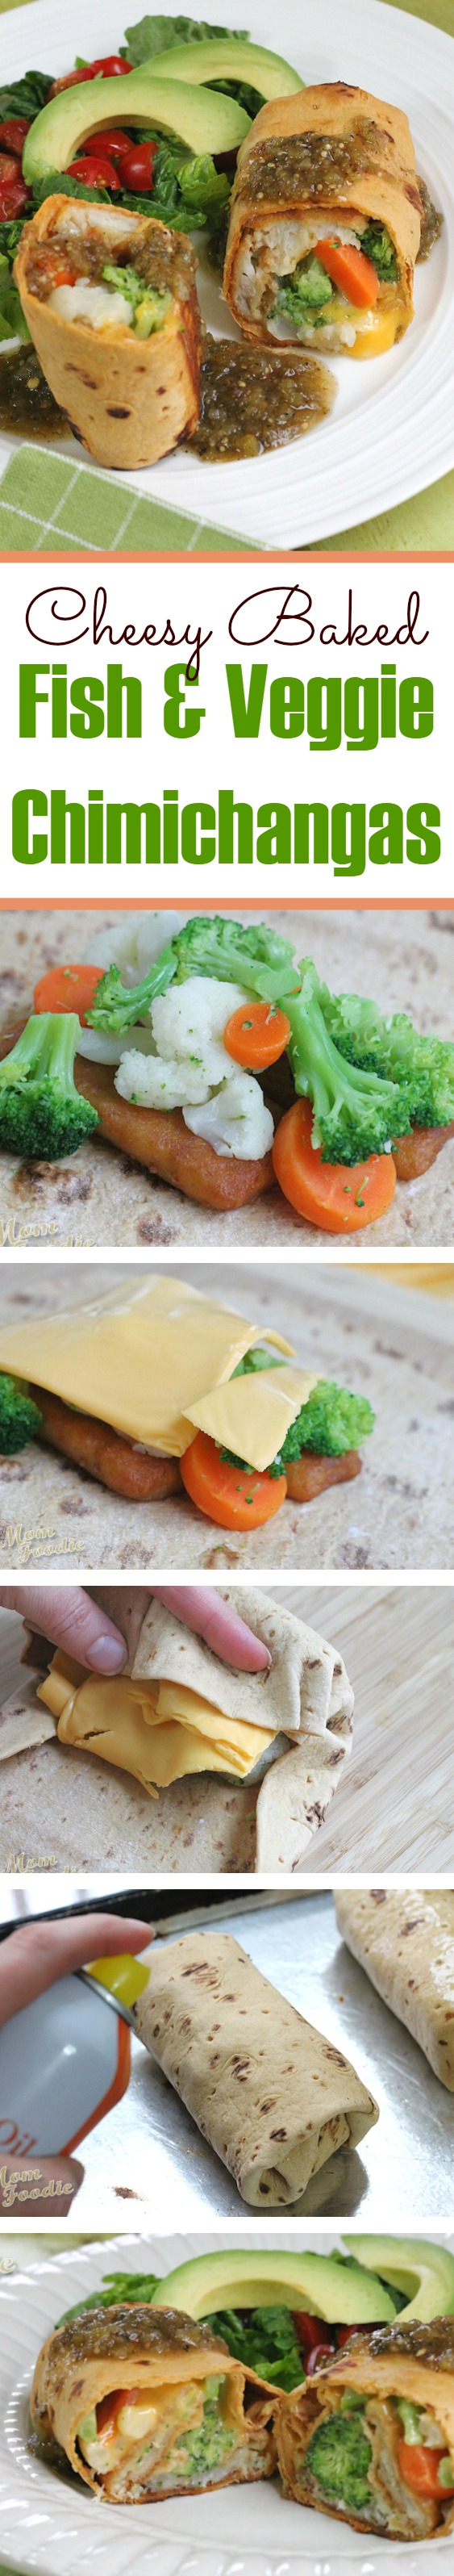 Cheesy Baked Fish & Veggie Chimichangas